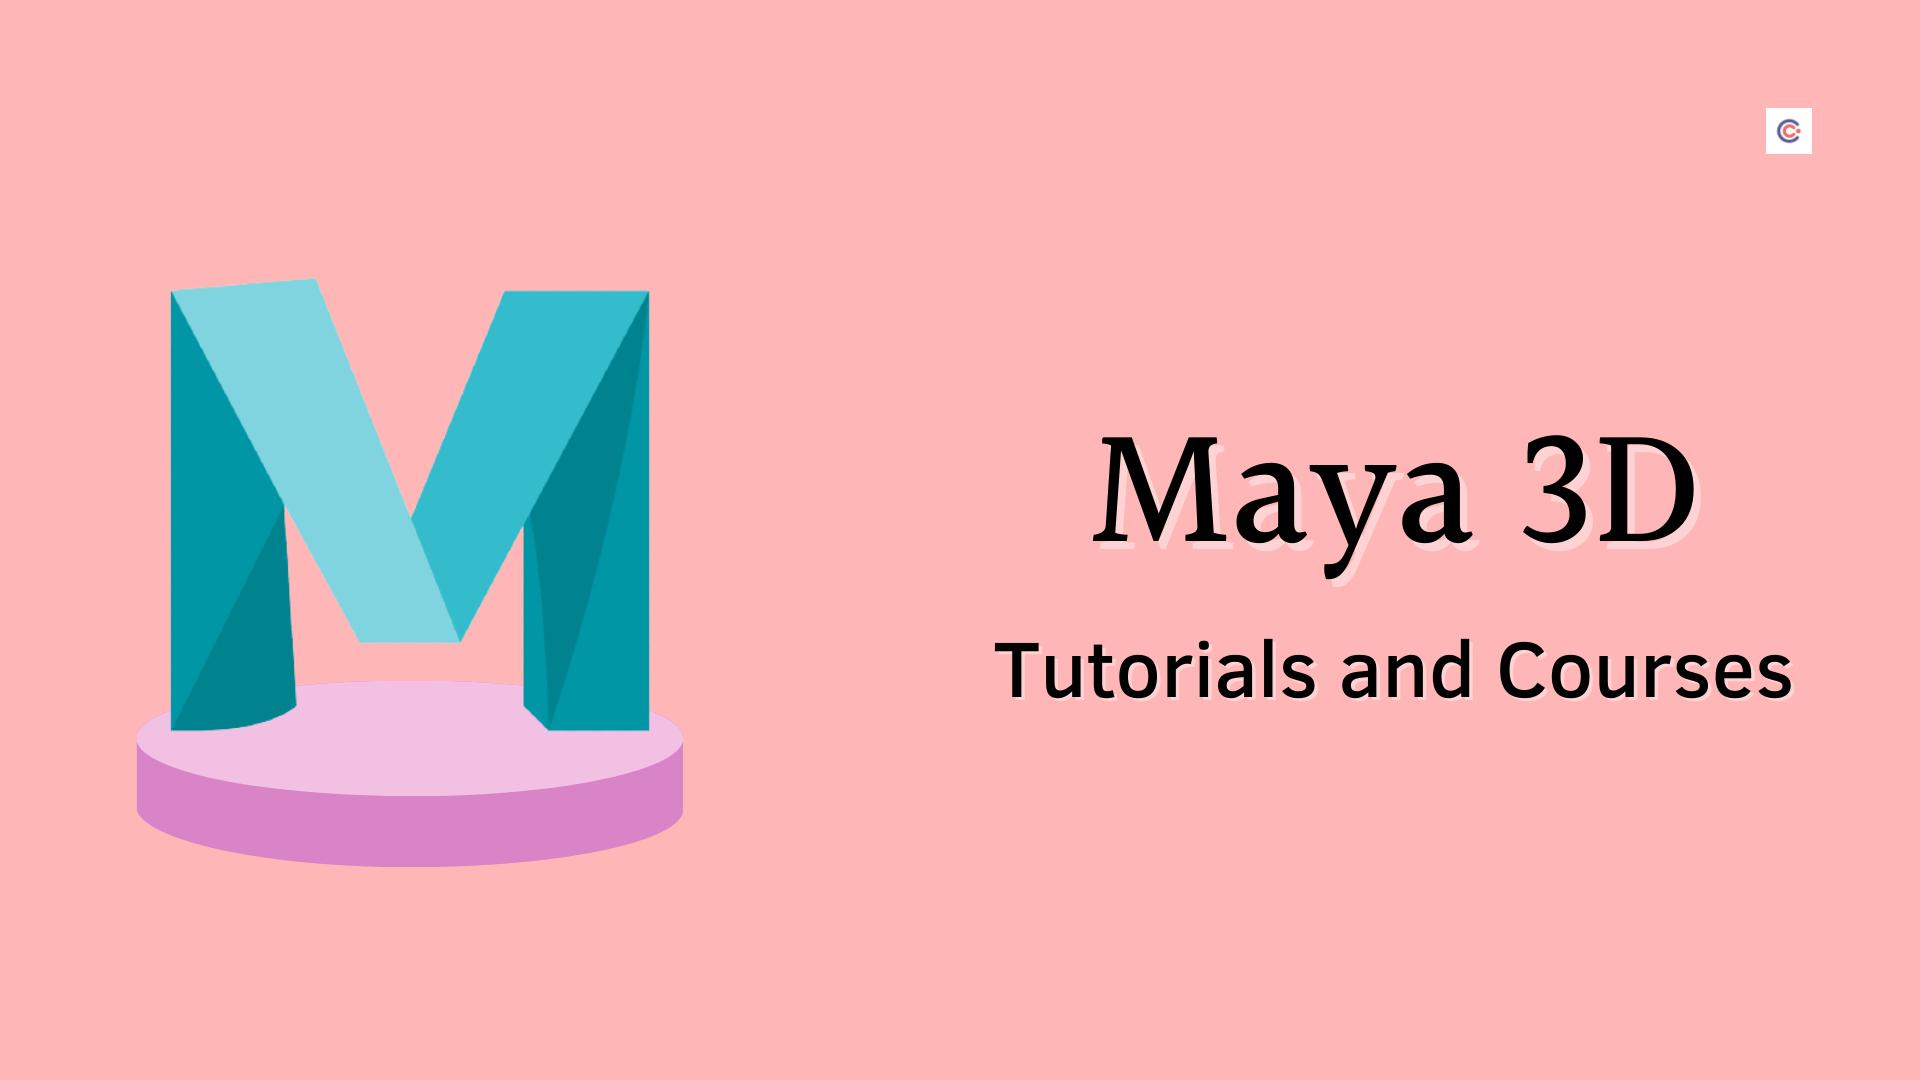 8 Best Maya 3D Tutorials and Courses - Learn Maya 3D Online